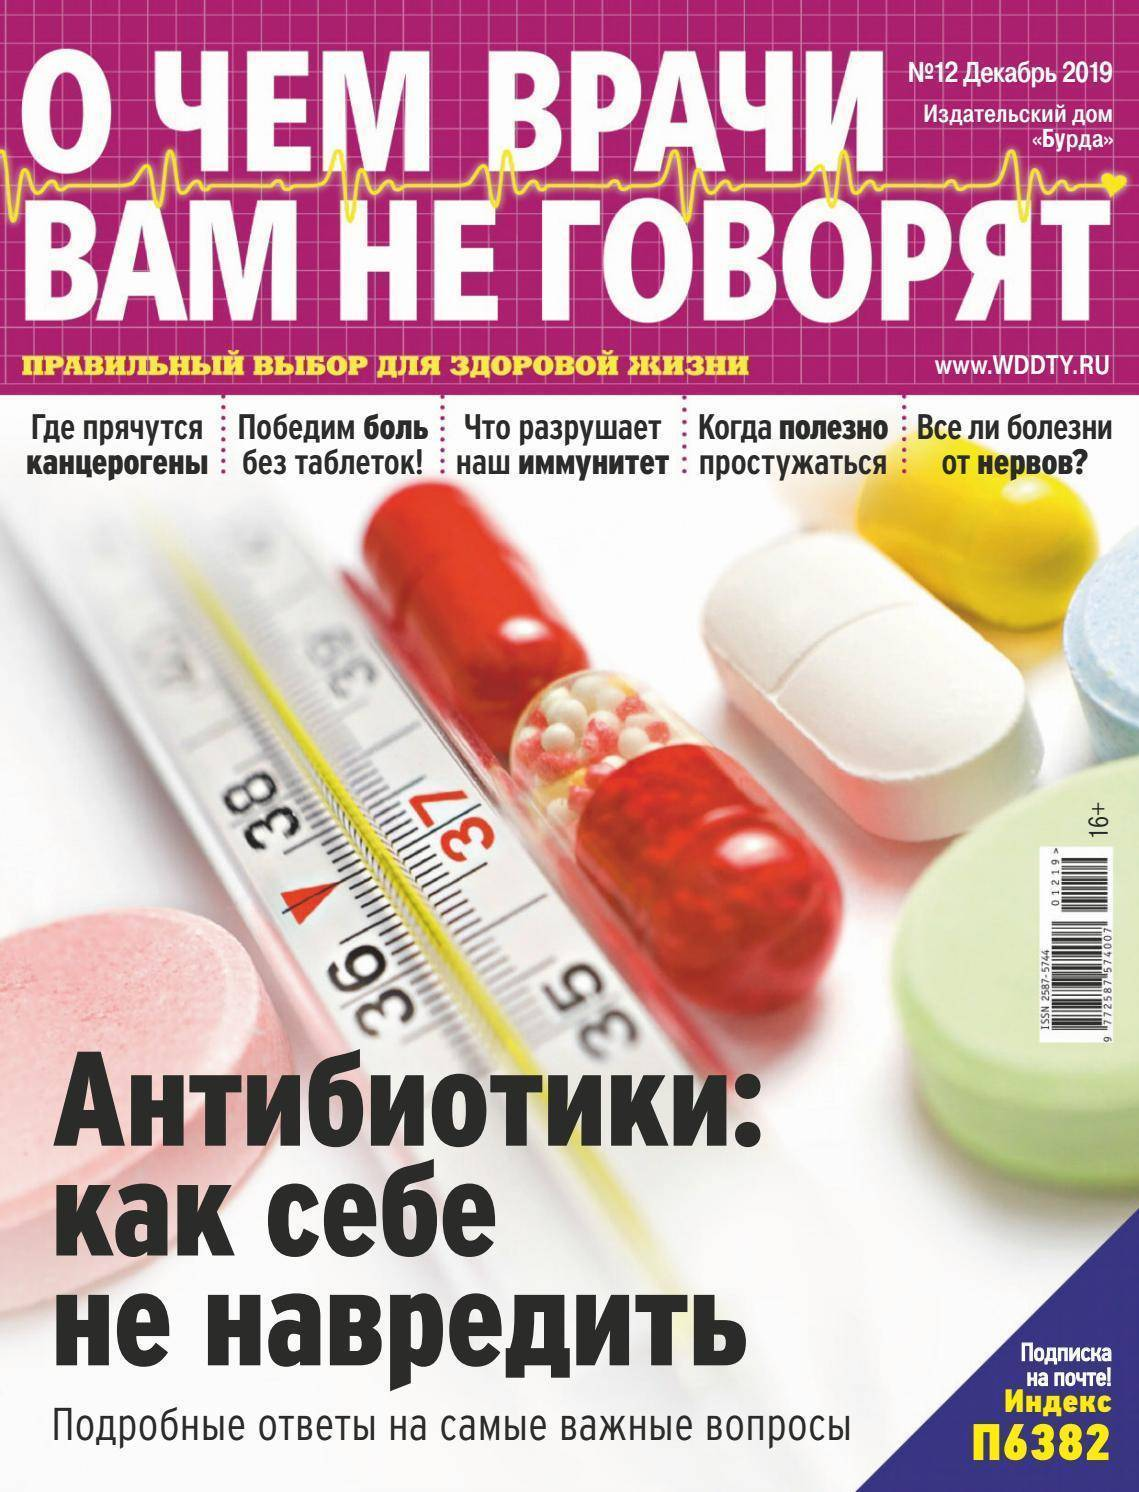 Антибиотики при укусе клеща